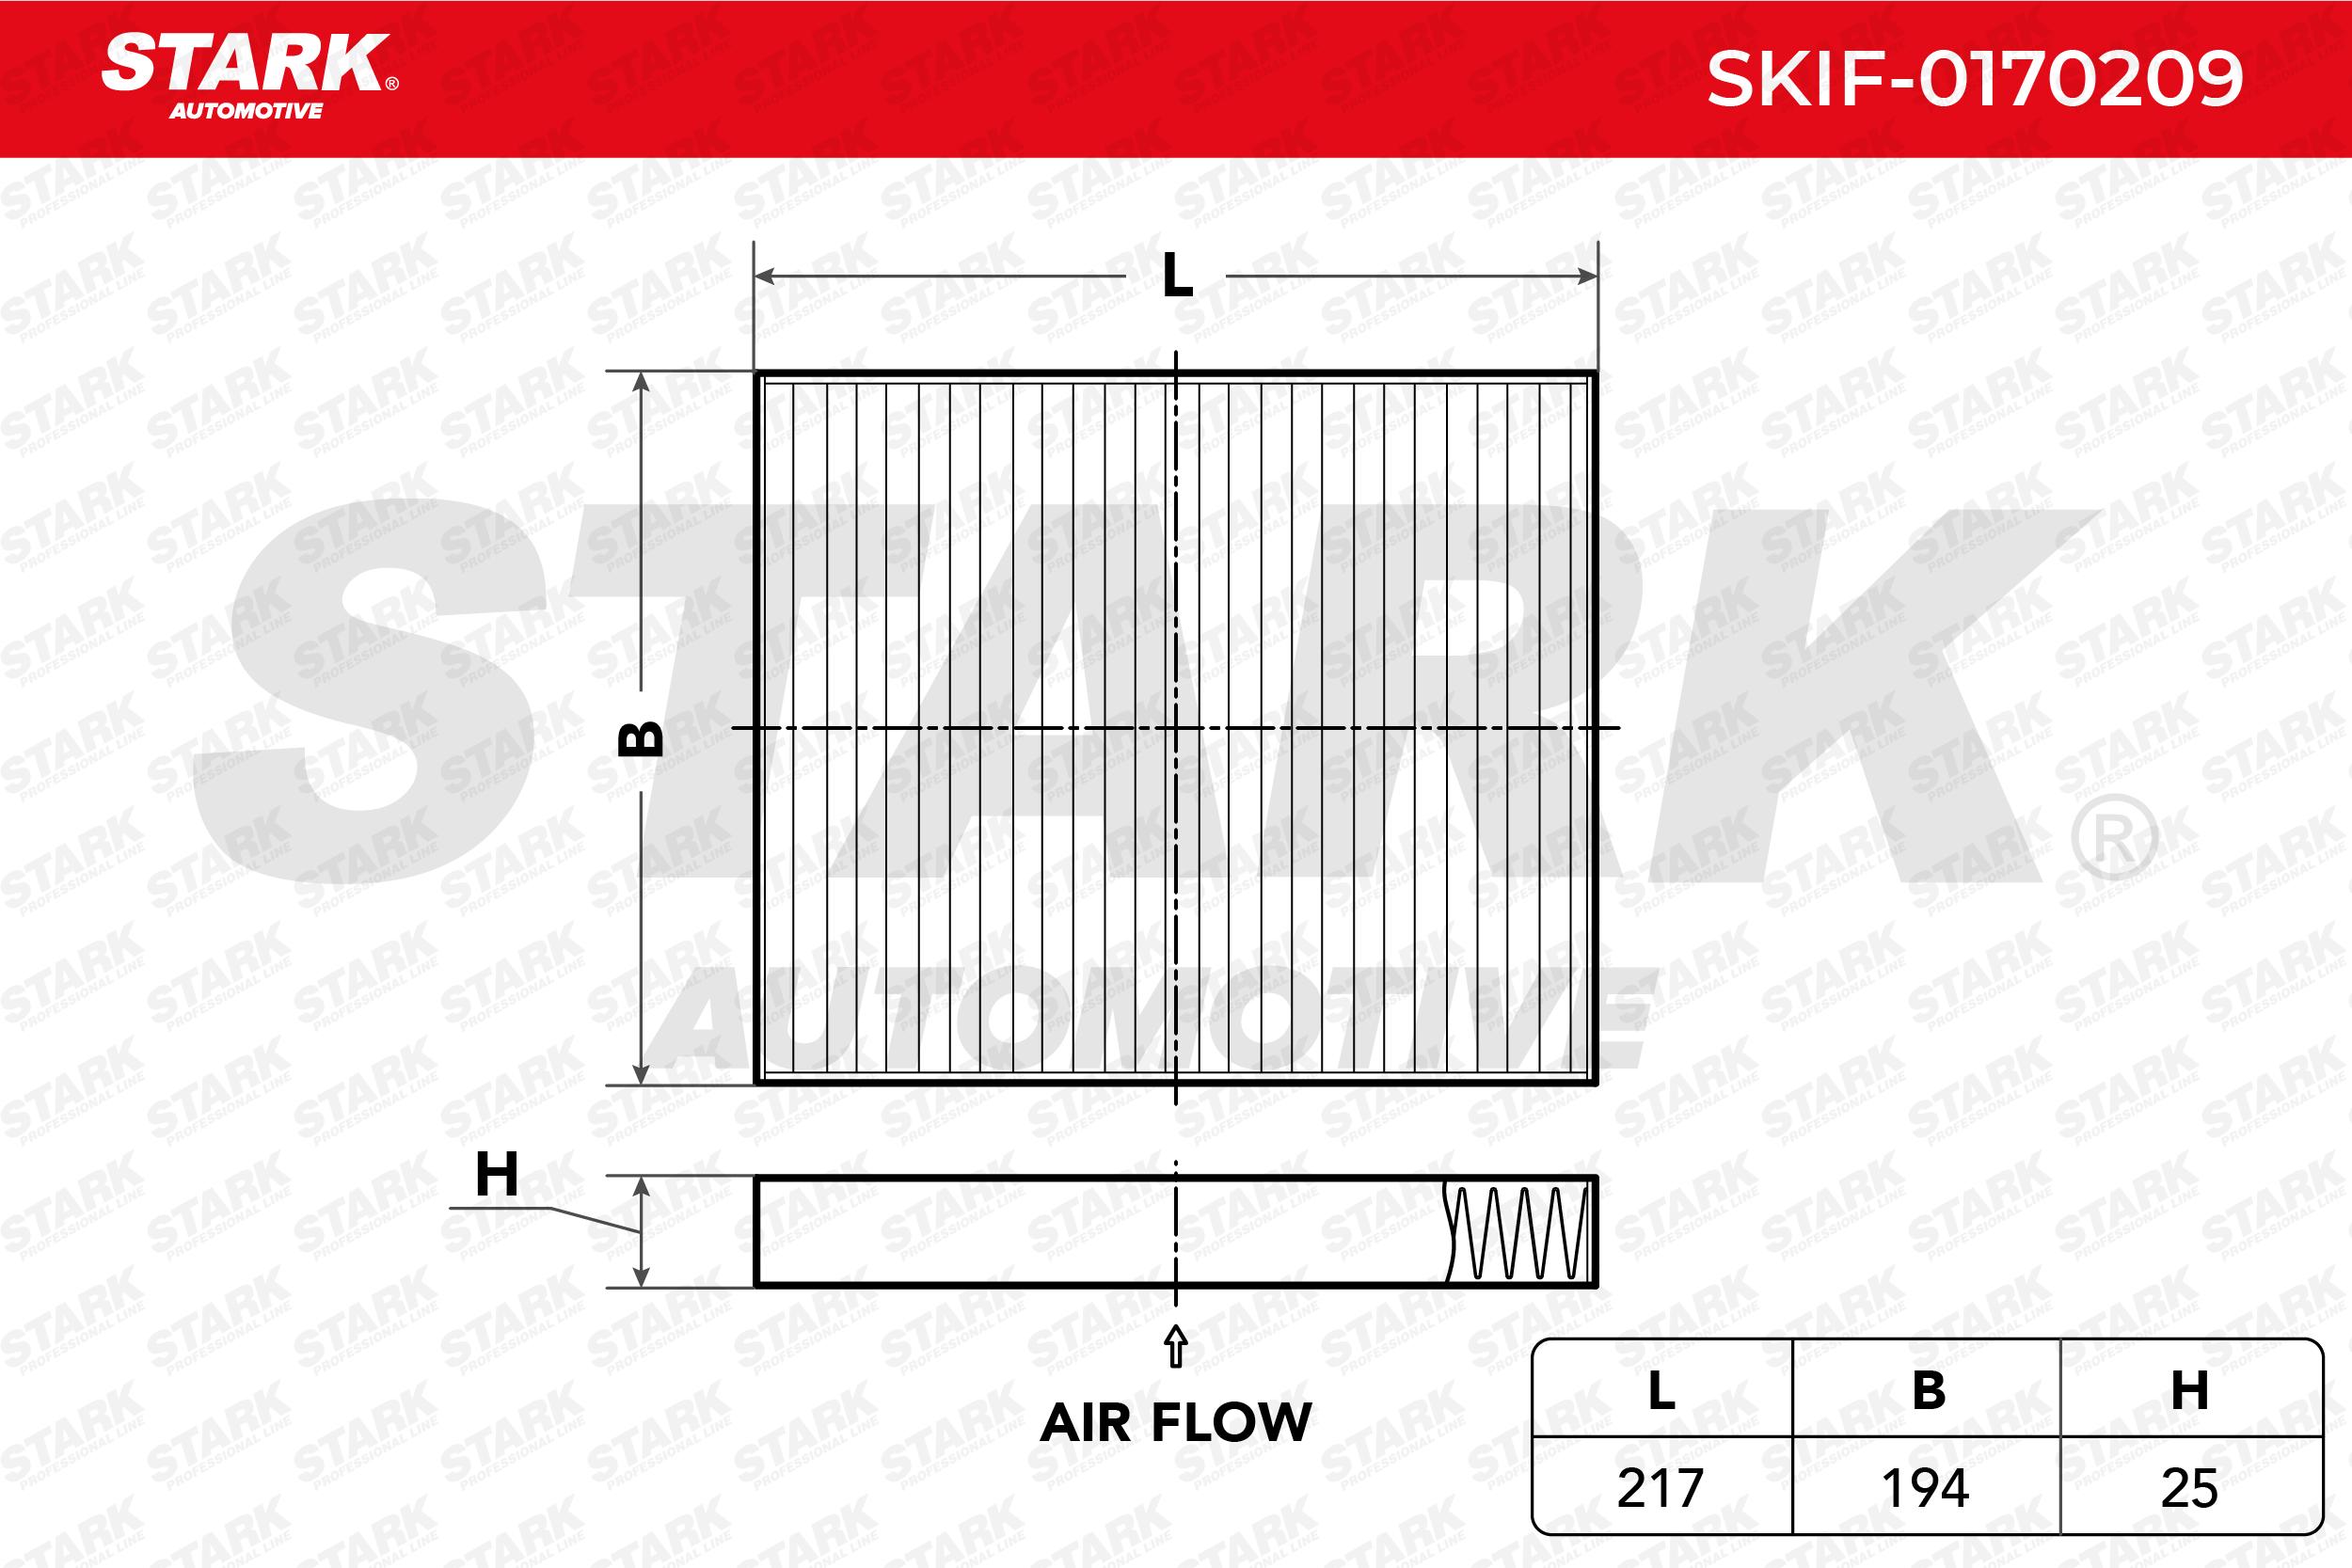 Innenraumfilter SKIF-0170209 STARK SKIF-0170209 in Original Qualität